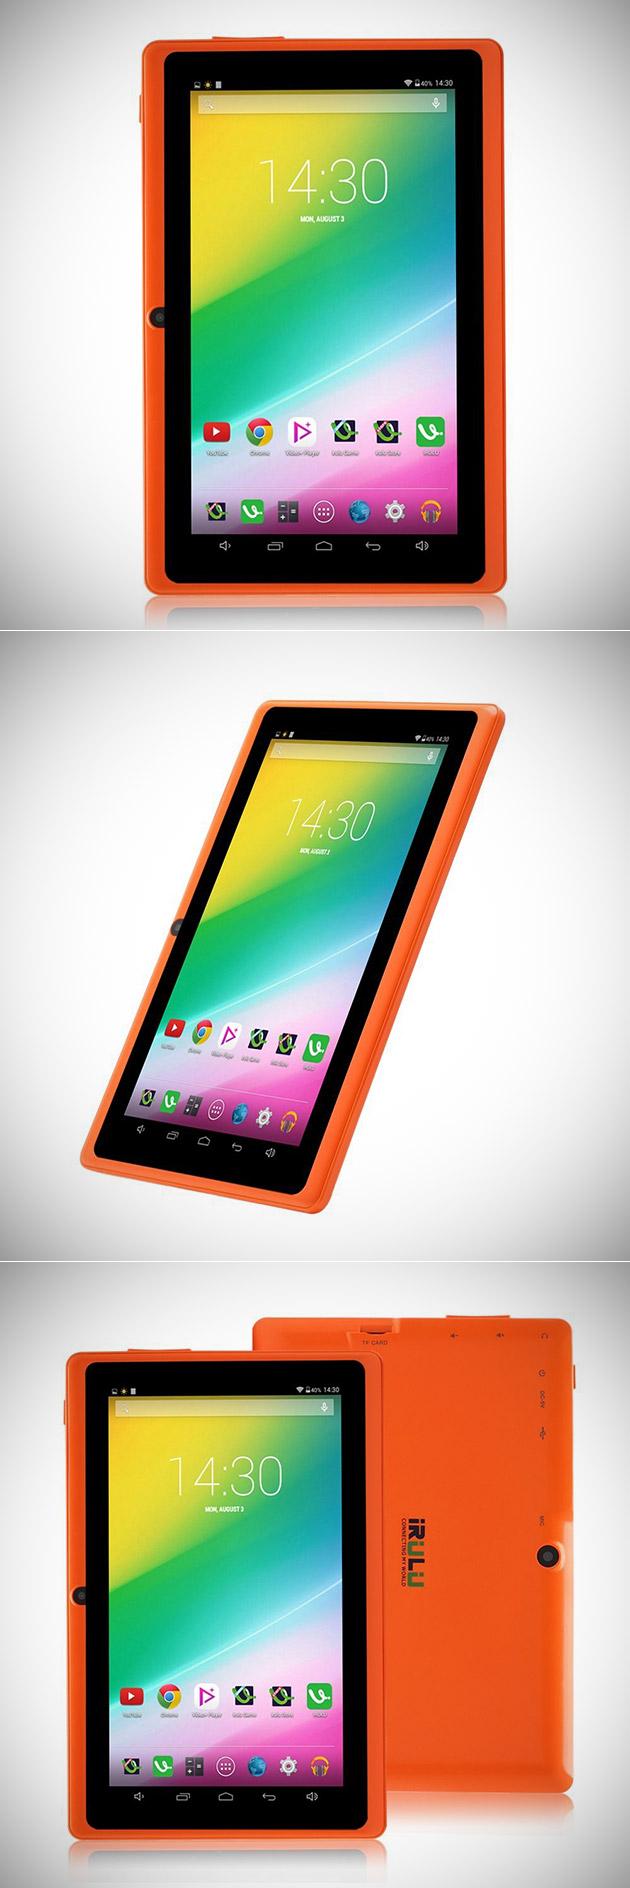 iRULU X1S Tablet